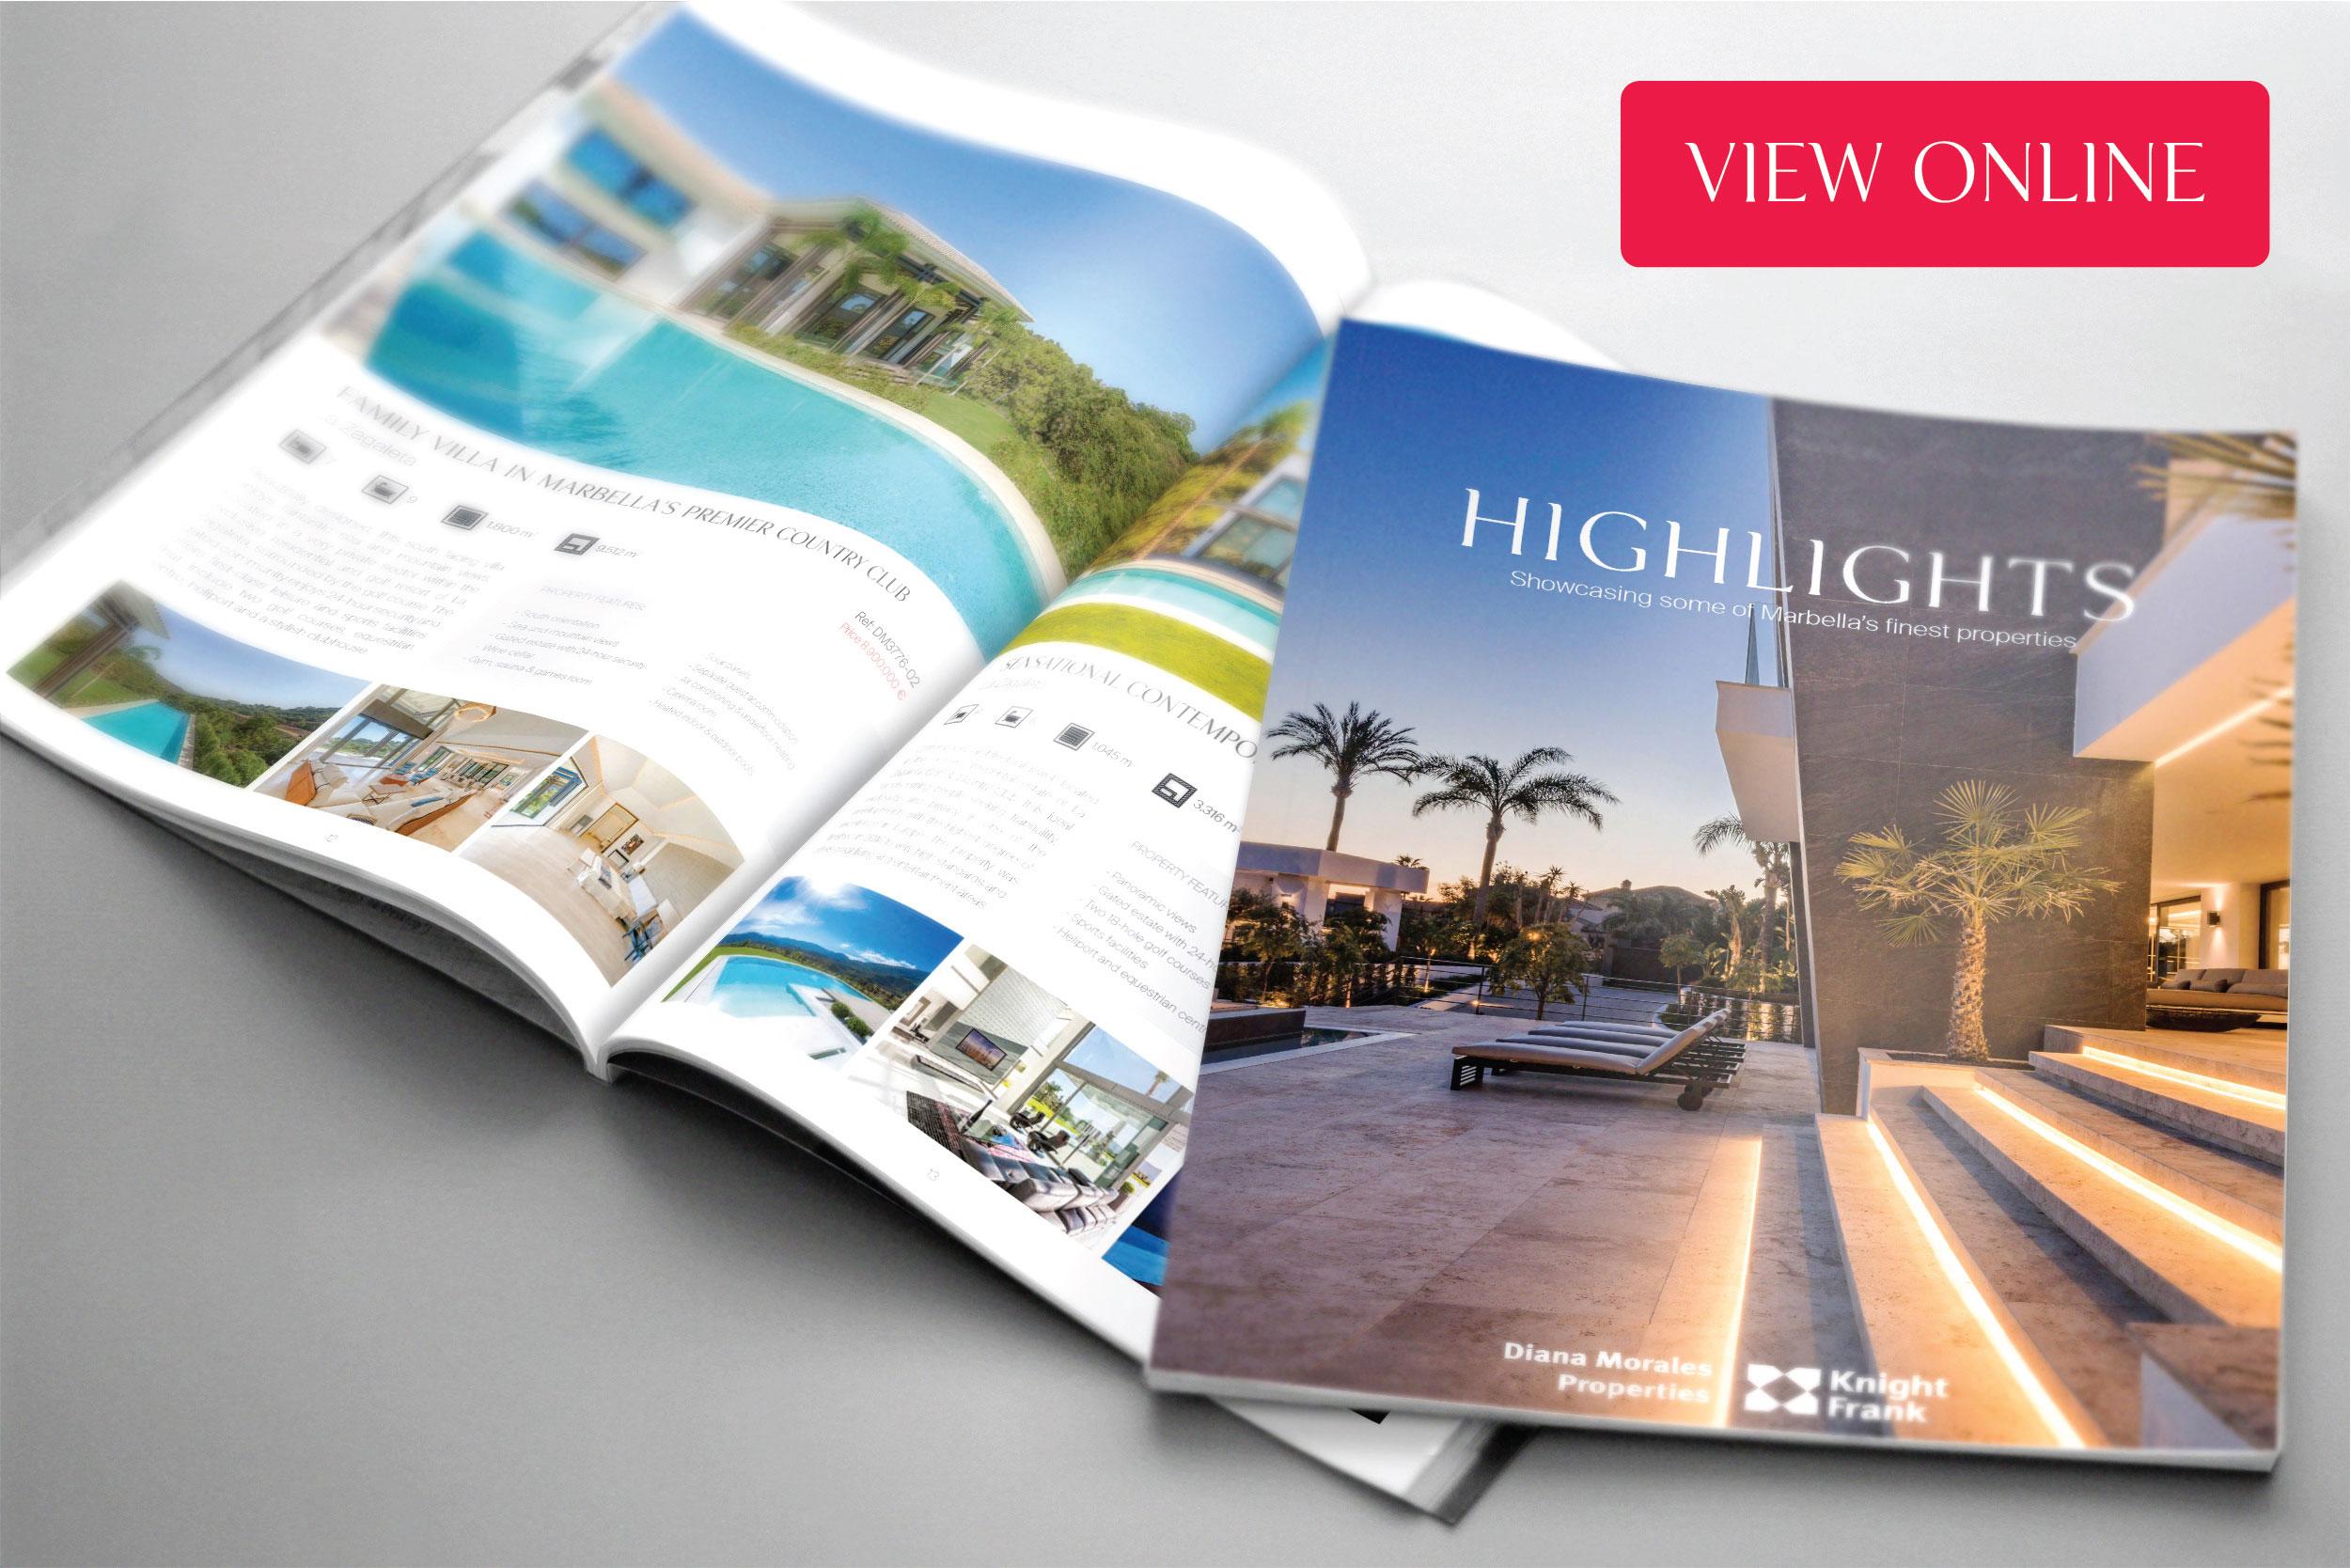 2017 Highlights Marbella property magazine